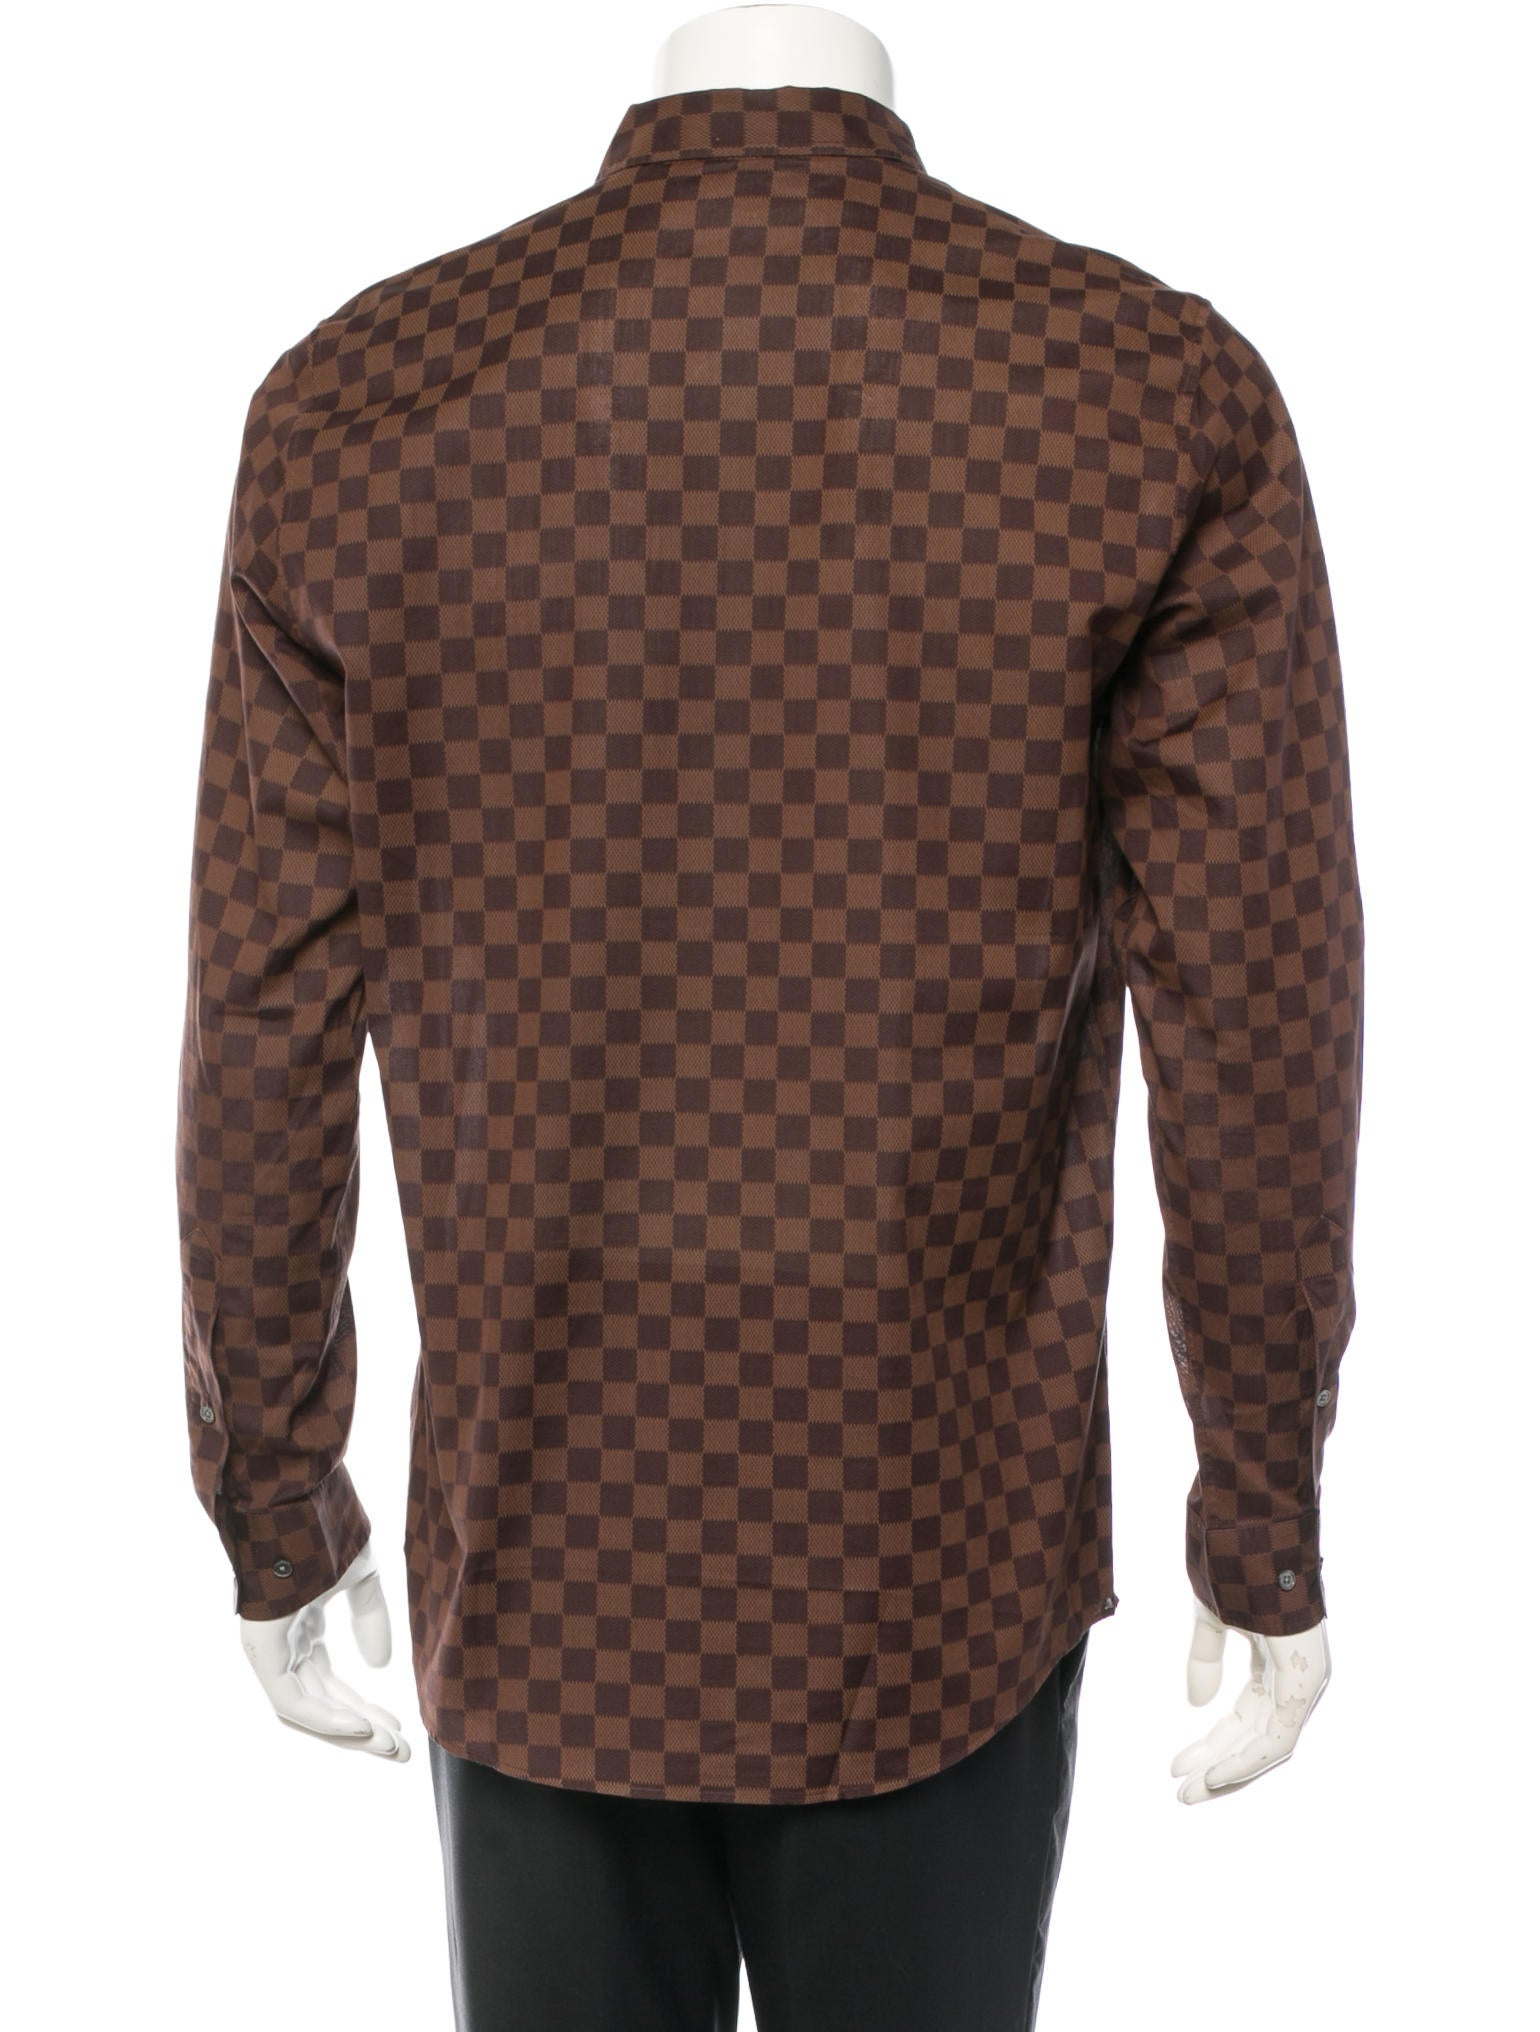 Louis Vuitton Mens Damier Shirt 58